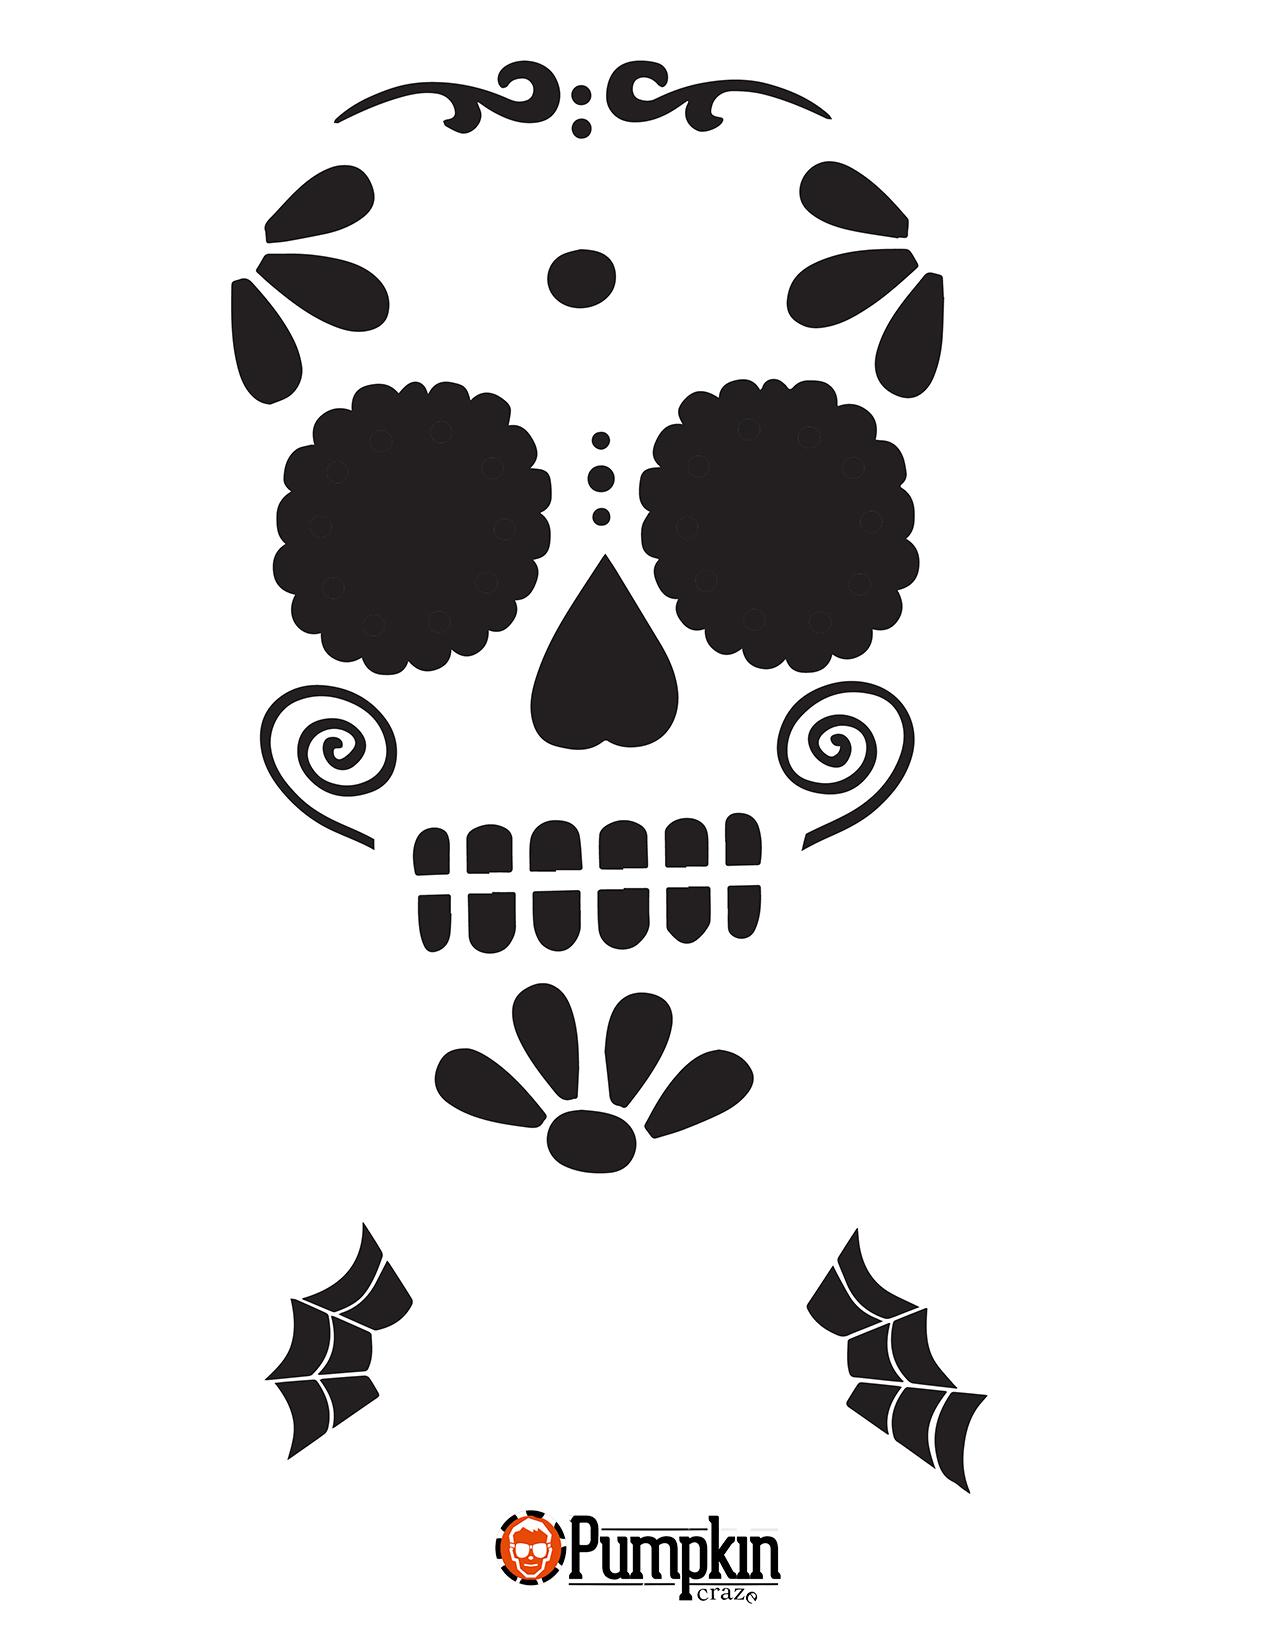 Pinrachel Gotta On All Hallows Eve In 2019   Sugar Skull Pumpkin - Free Printable Sugar Skull Pumpkin Stencils